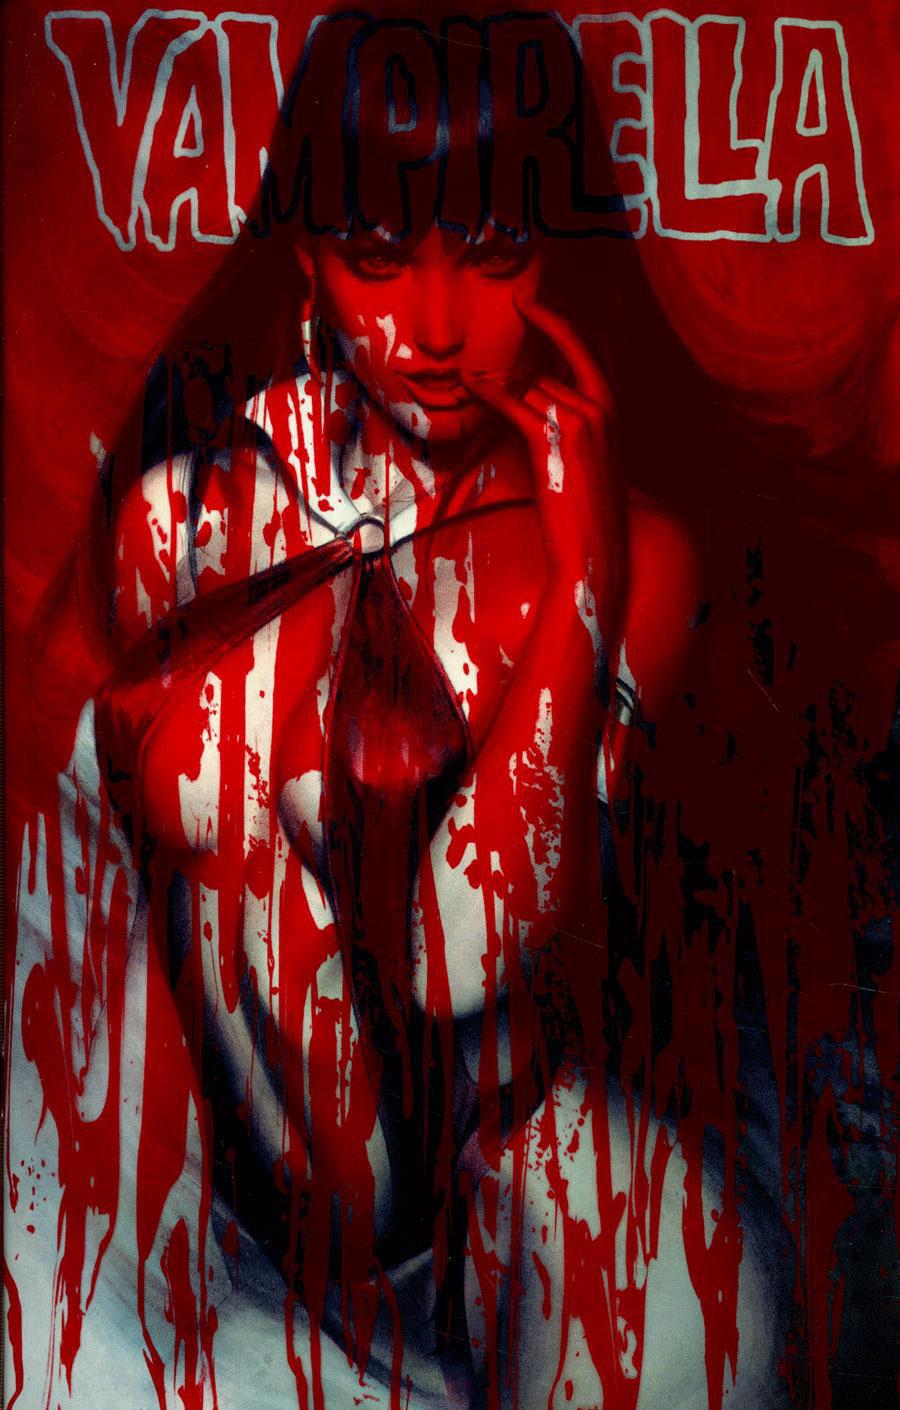 Vampirella Vol 8 #6 Cover A Regular Stanley Artgerm Lau Blood Splattered Acetate Cover